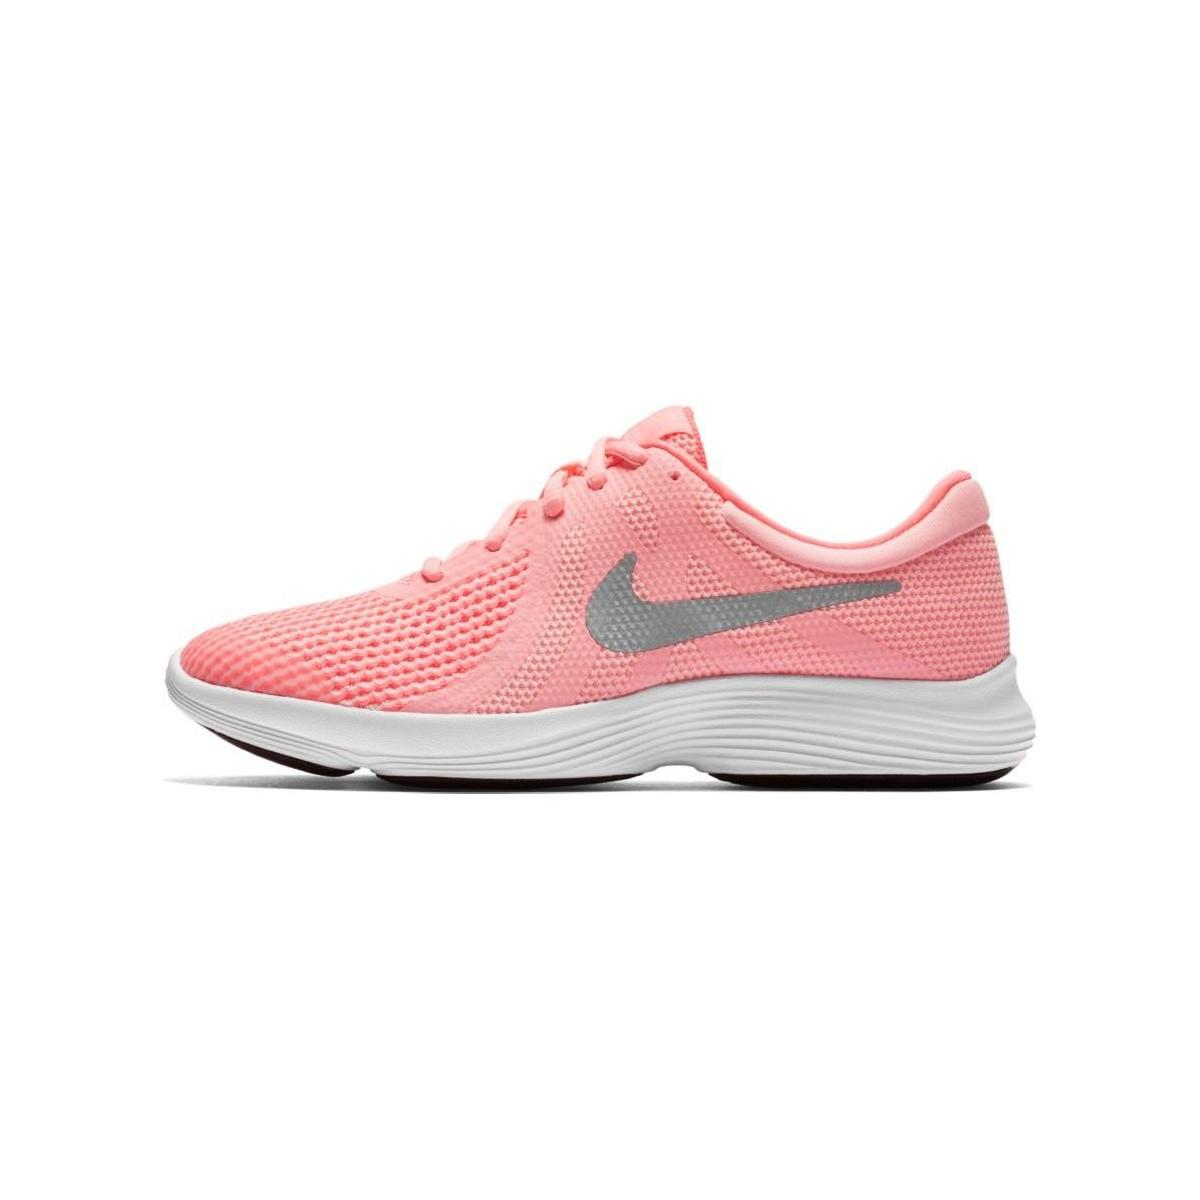 f751e591061f1 Nike Girls  Revolution 4 (gs) Running Shoe 943306 600 Women s ...